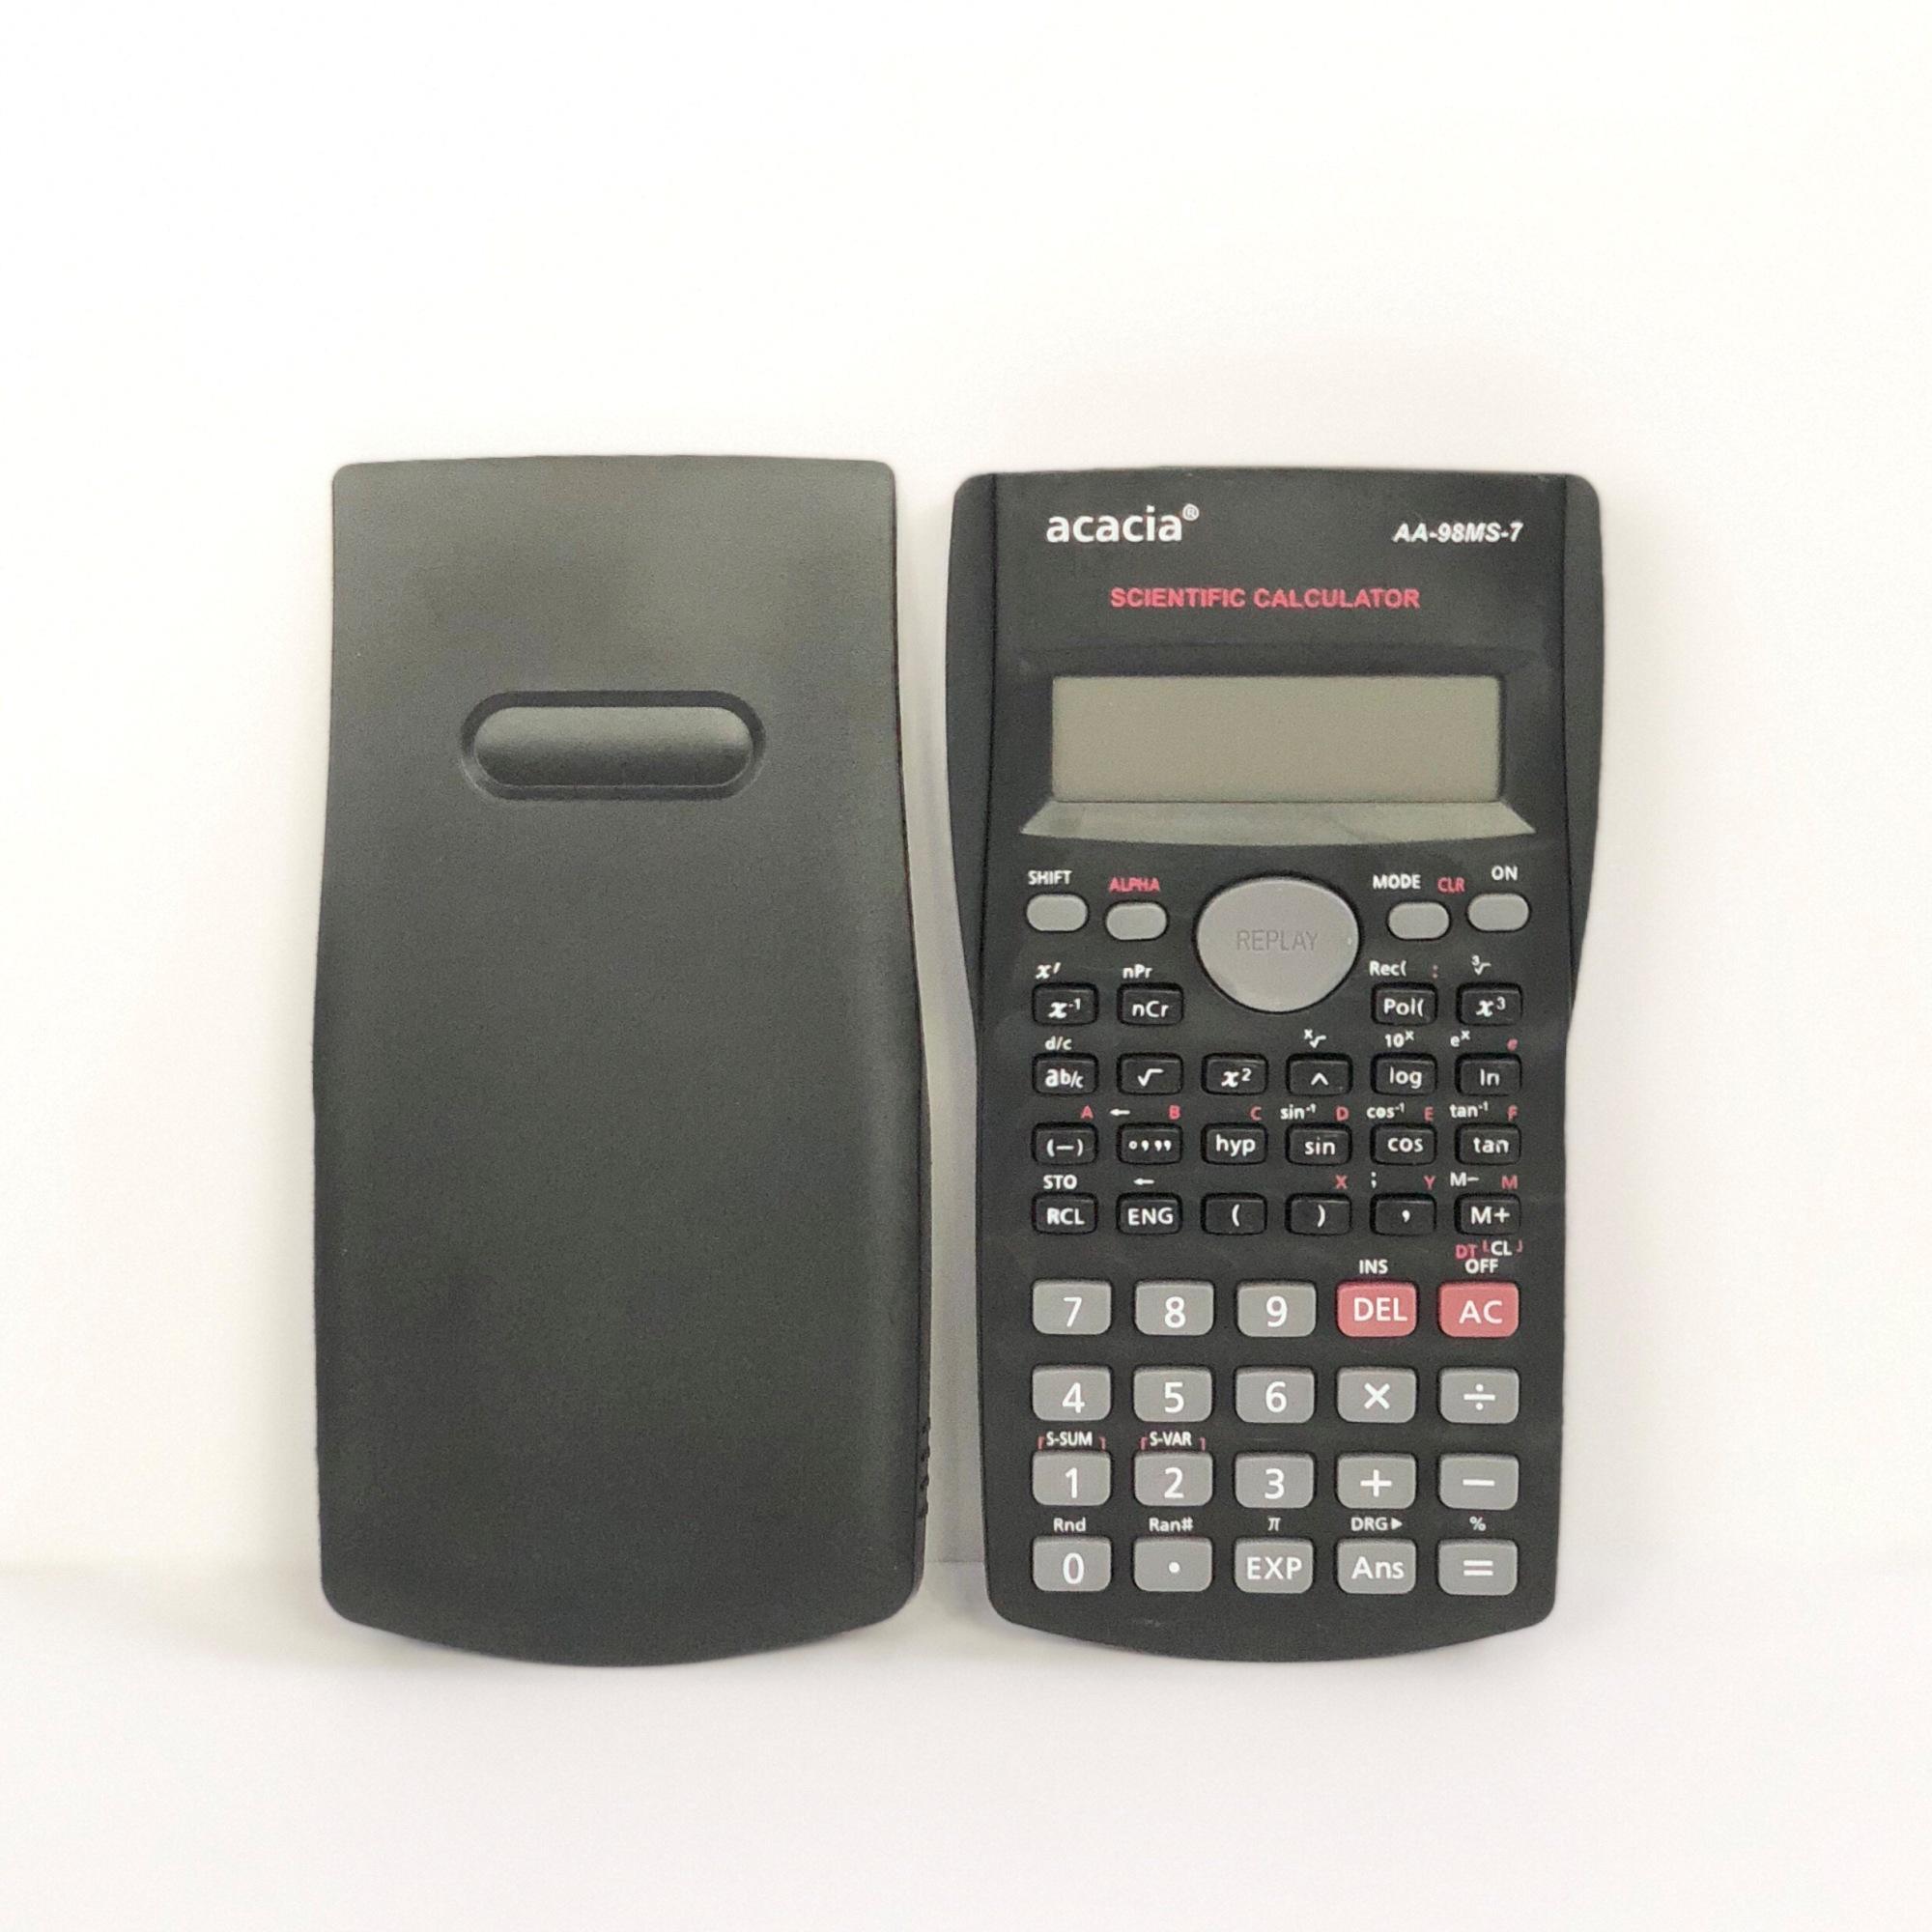 Calculator For Sale Calculators Prices Brands Review In Kalkulator Casio Portable Printer Hr 8 Tm 12 Digits Scientific Aa 98ms 7